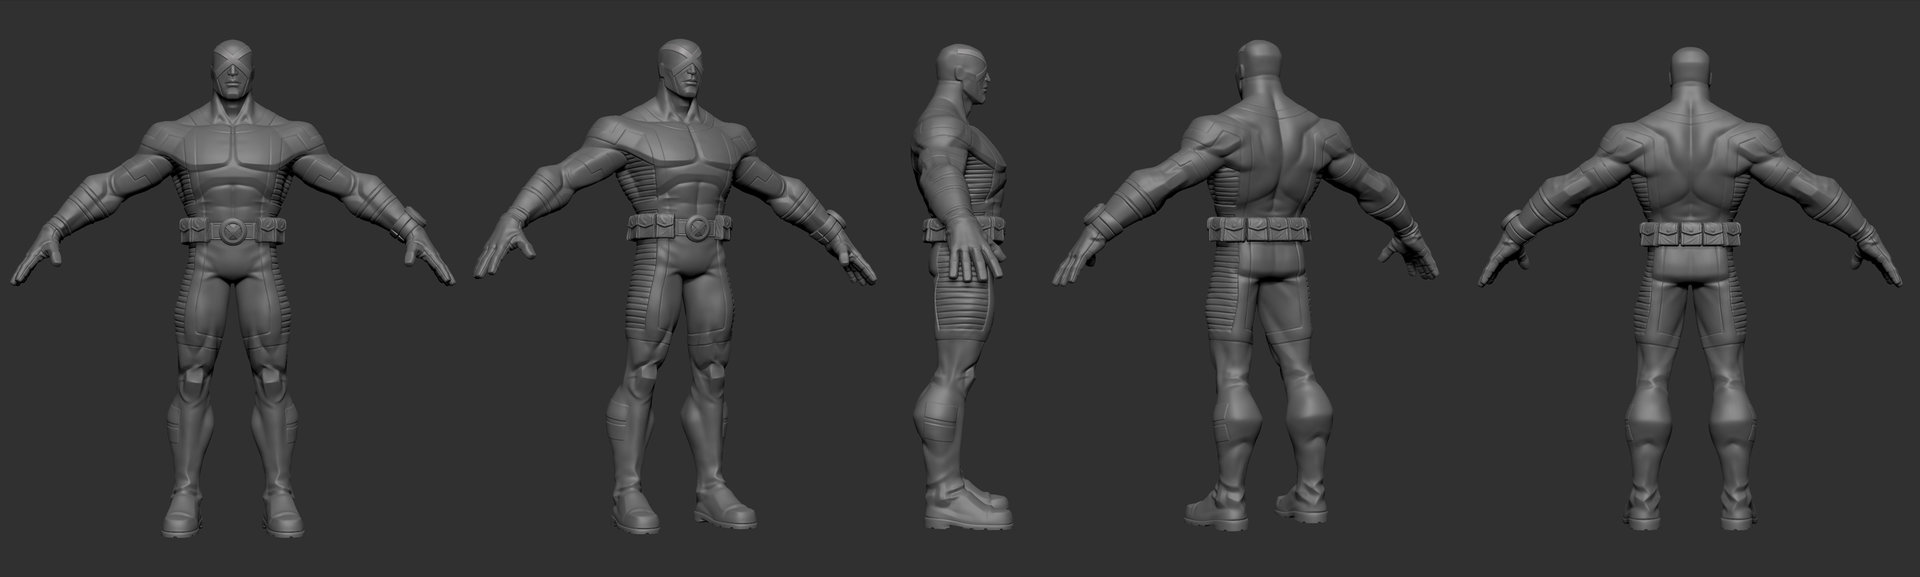 Robert fink xfacecyclops turnaround body